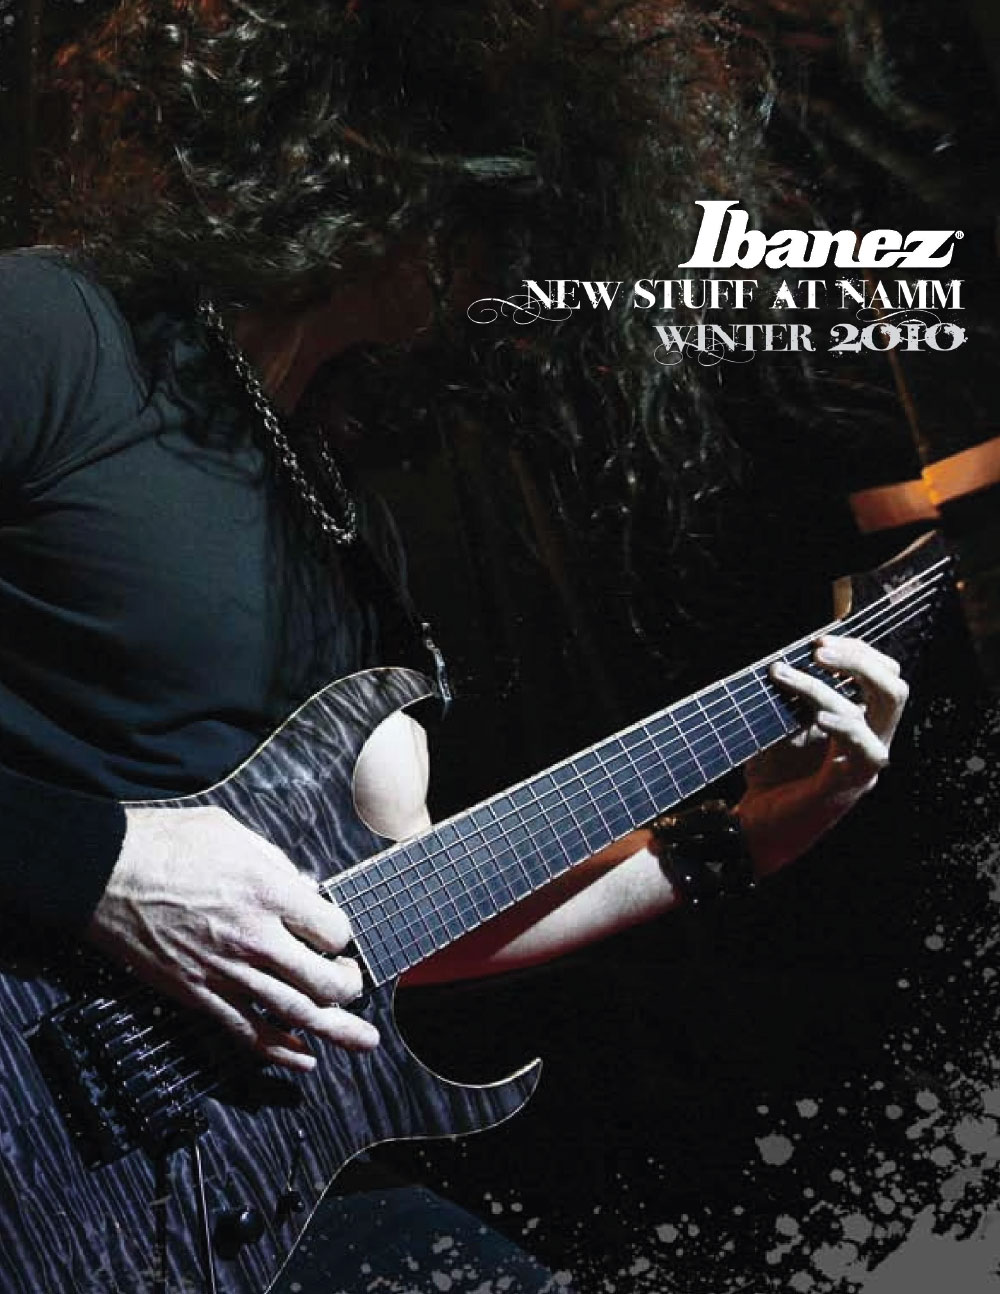 Ibanez Catalog News 2010 Winter